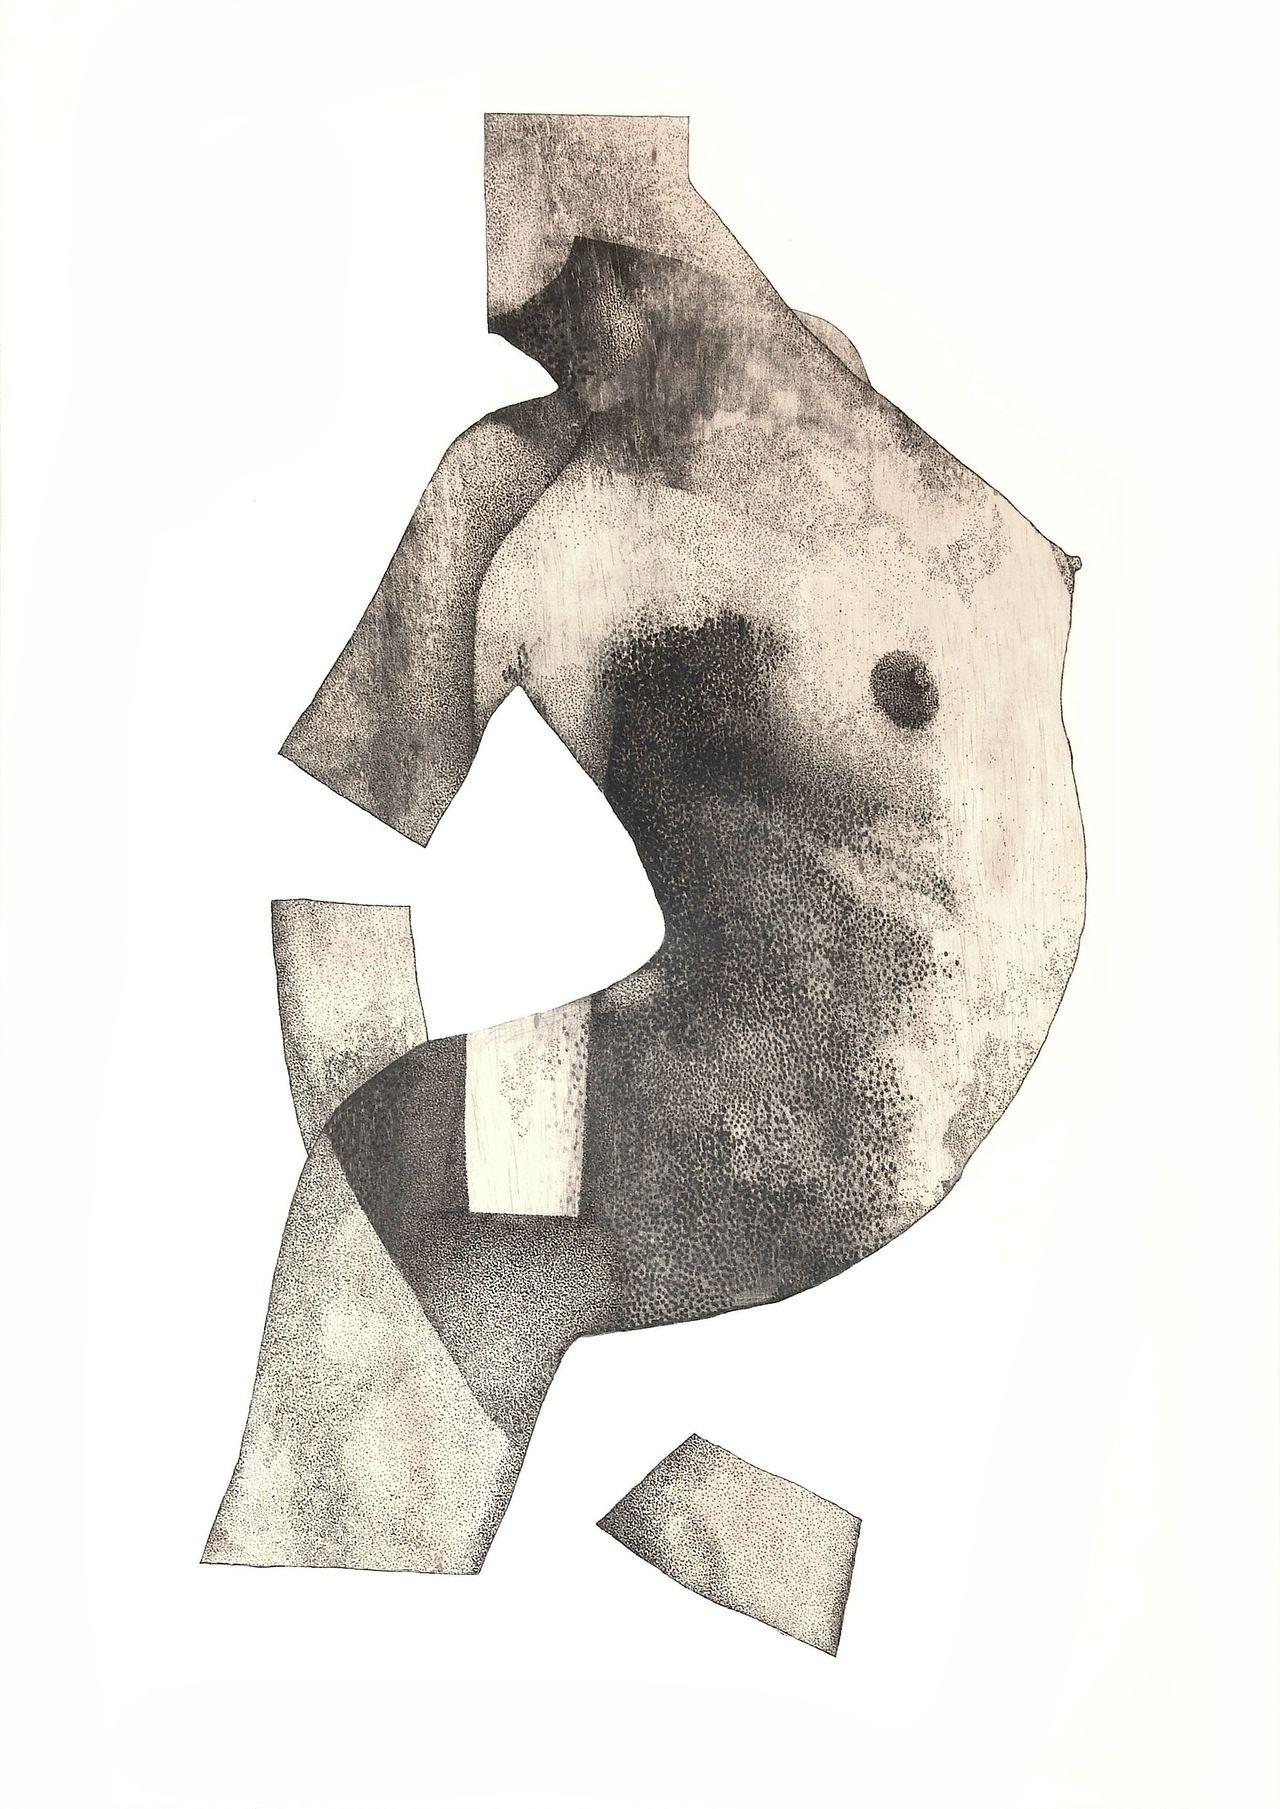 Evan Isoline  'Priestess'  Mixed media on wood panel, 2012